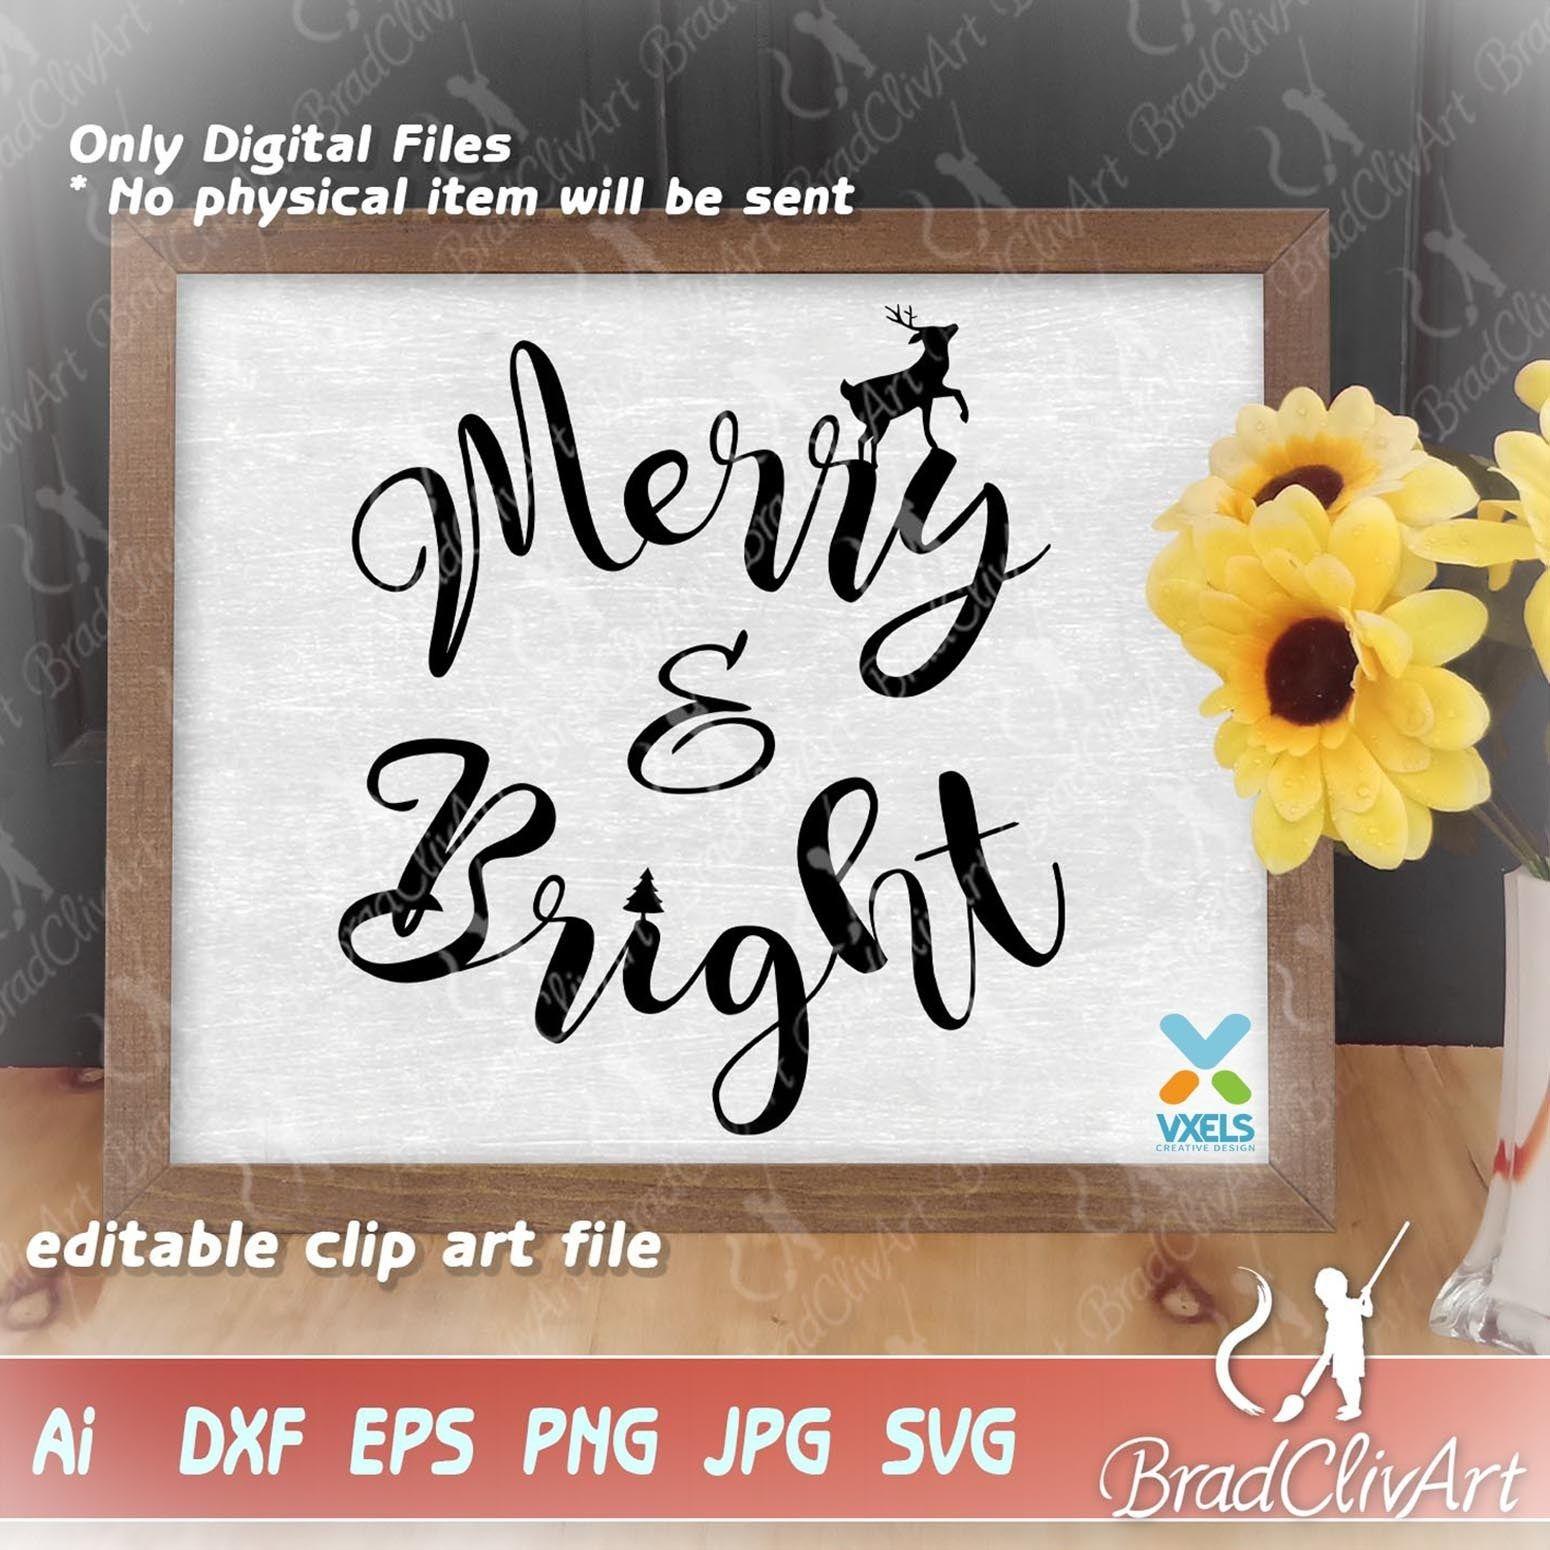 Pin on Christmas Cut File